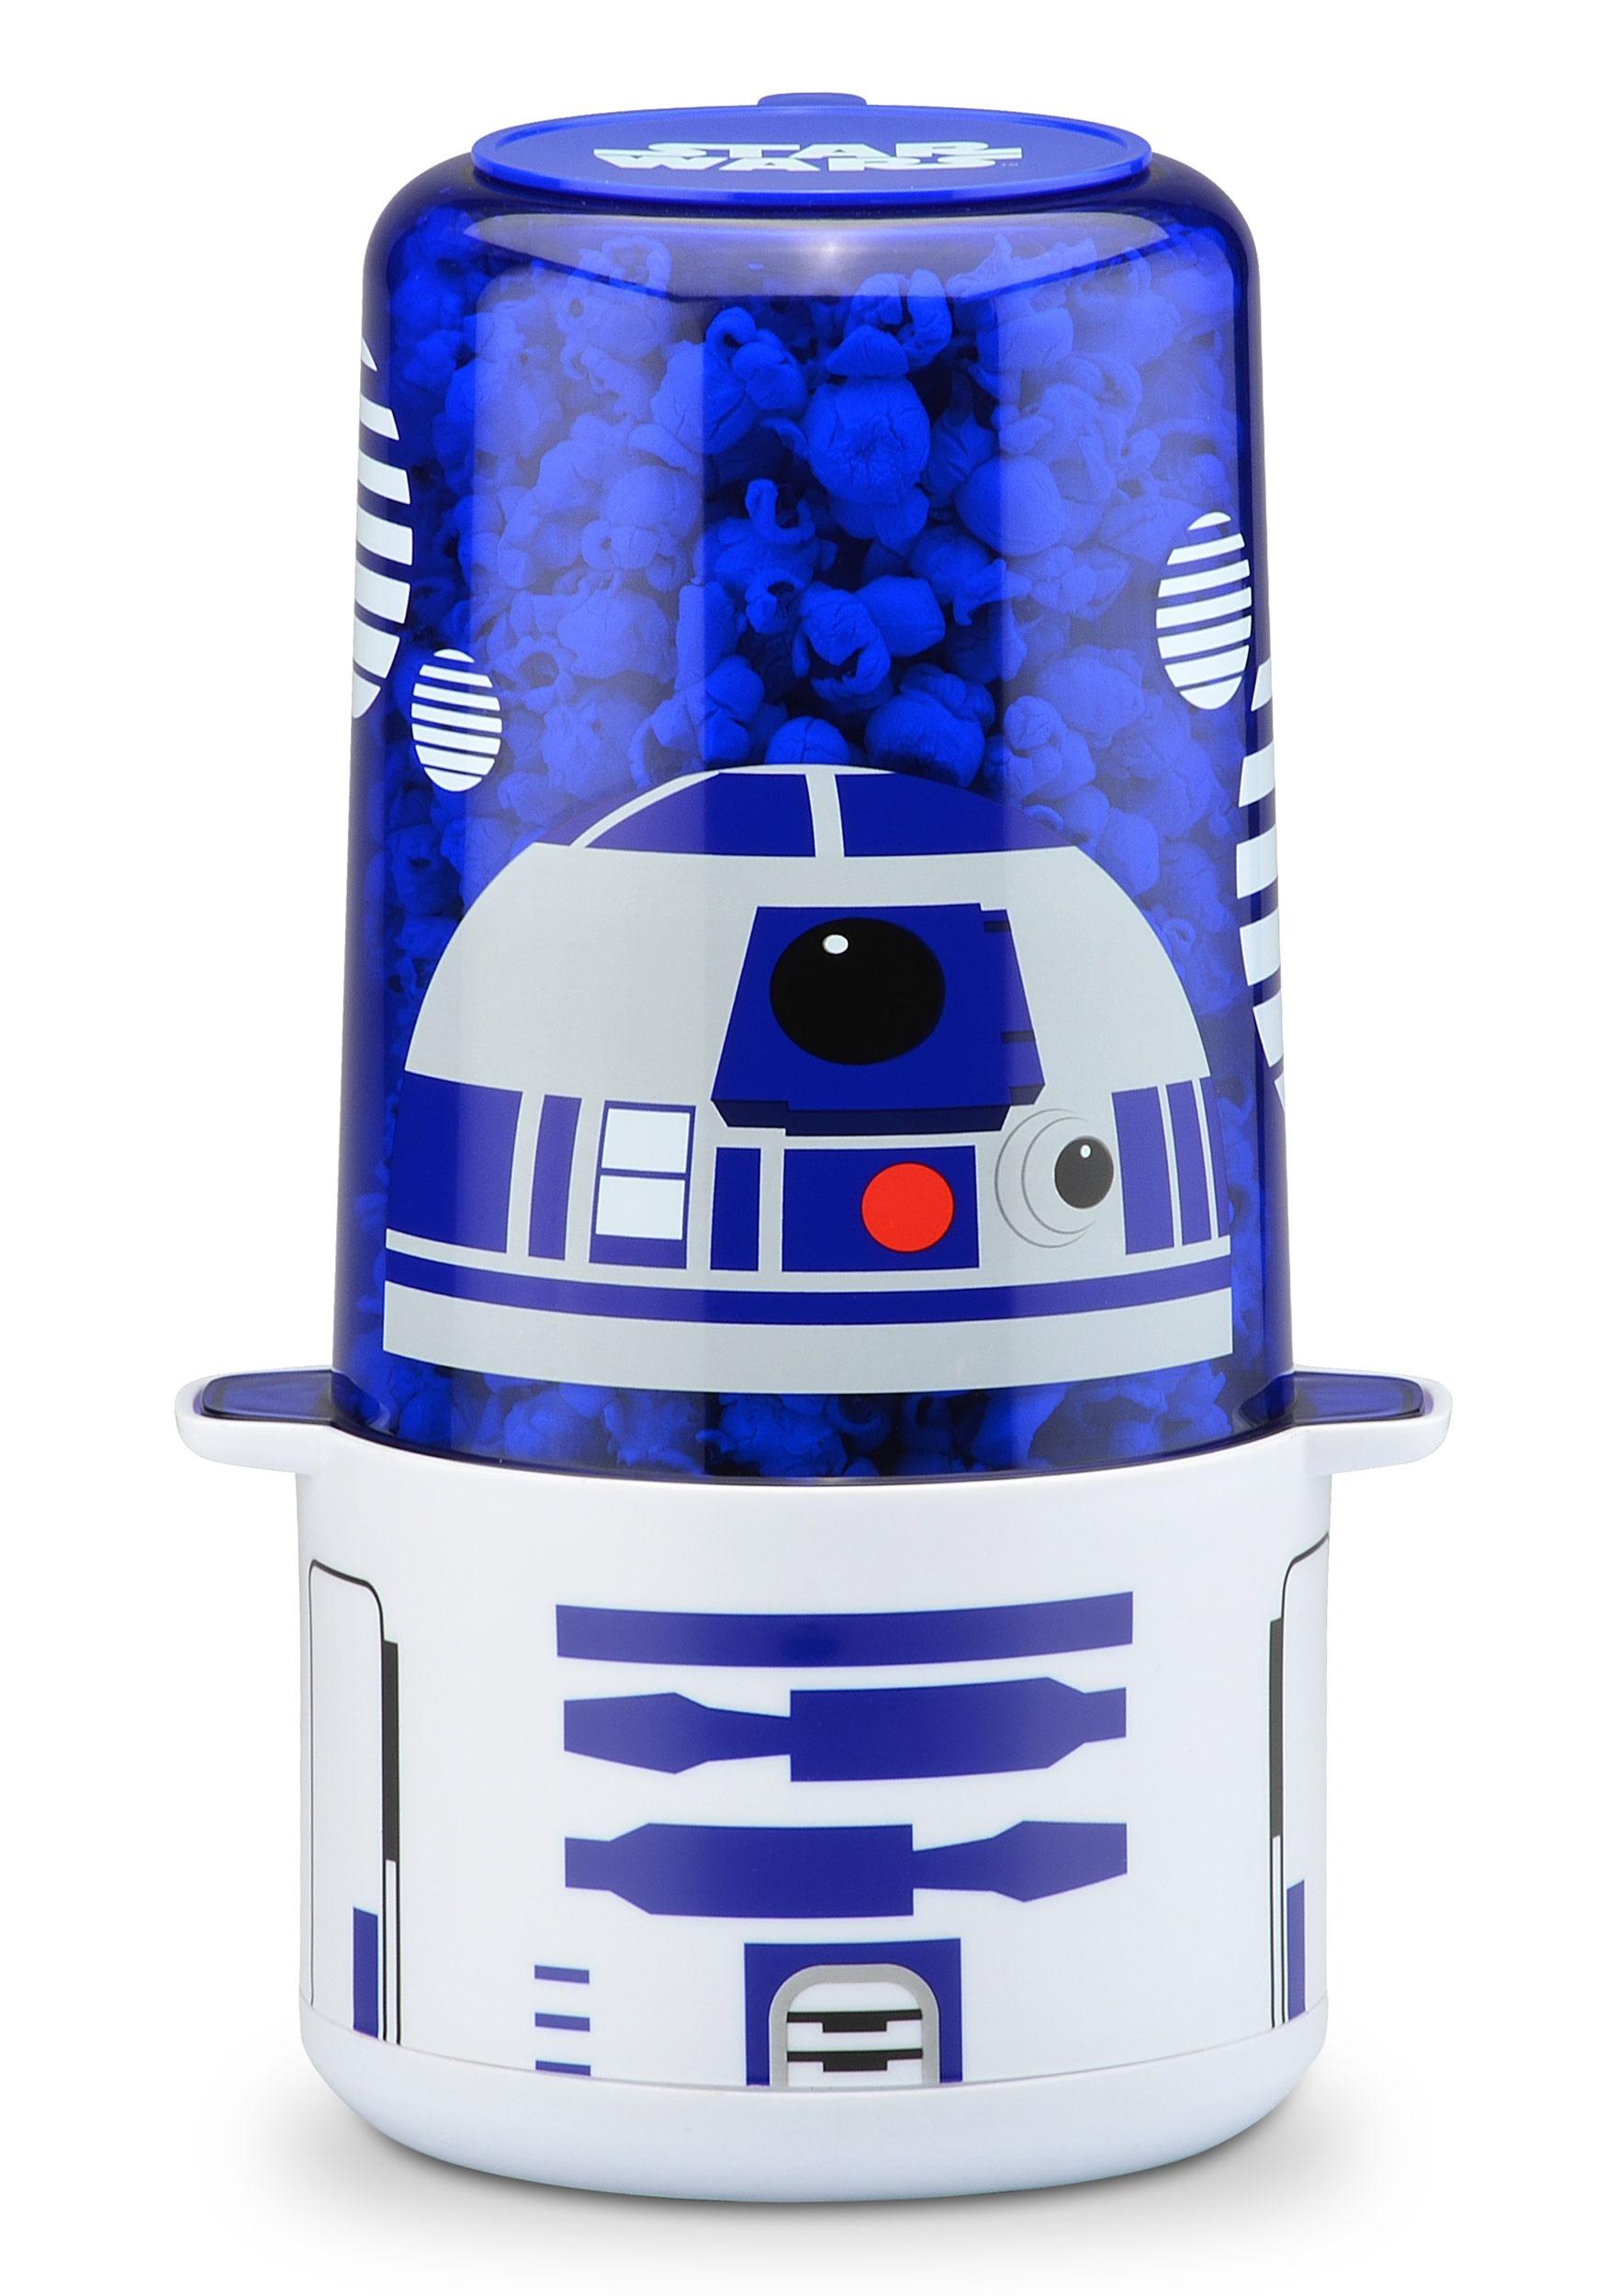 R2D2 Star Wars Mini Stir Popcorn Popper R D Home Planetarium Projector on home observatory, home star projectors, planetary projector, astronomy projector,